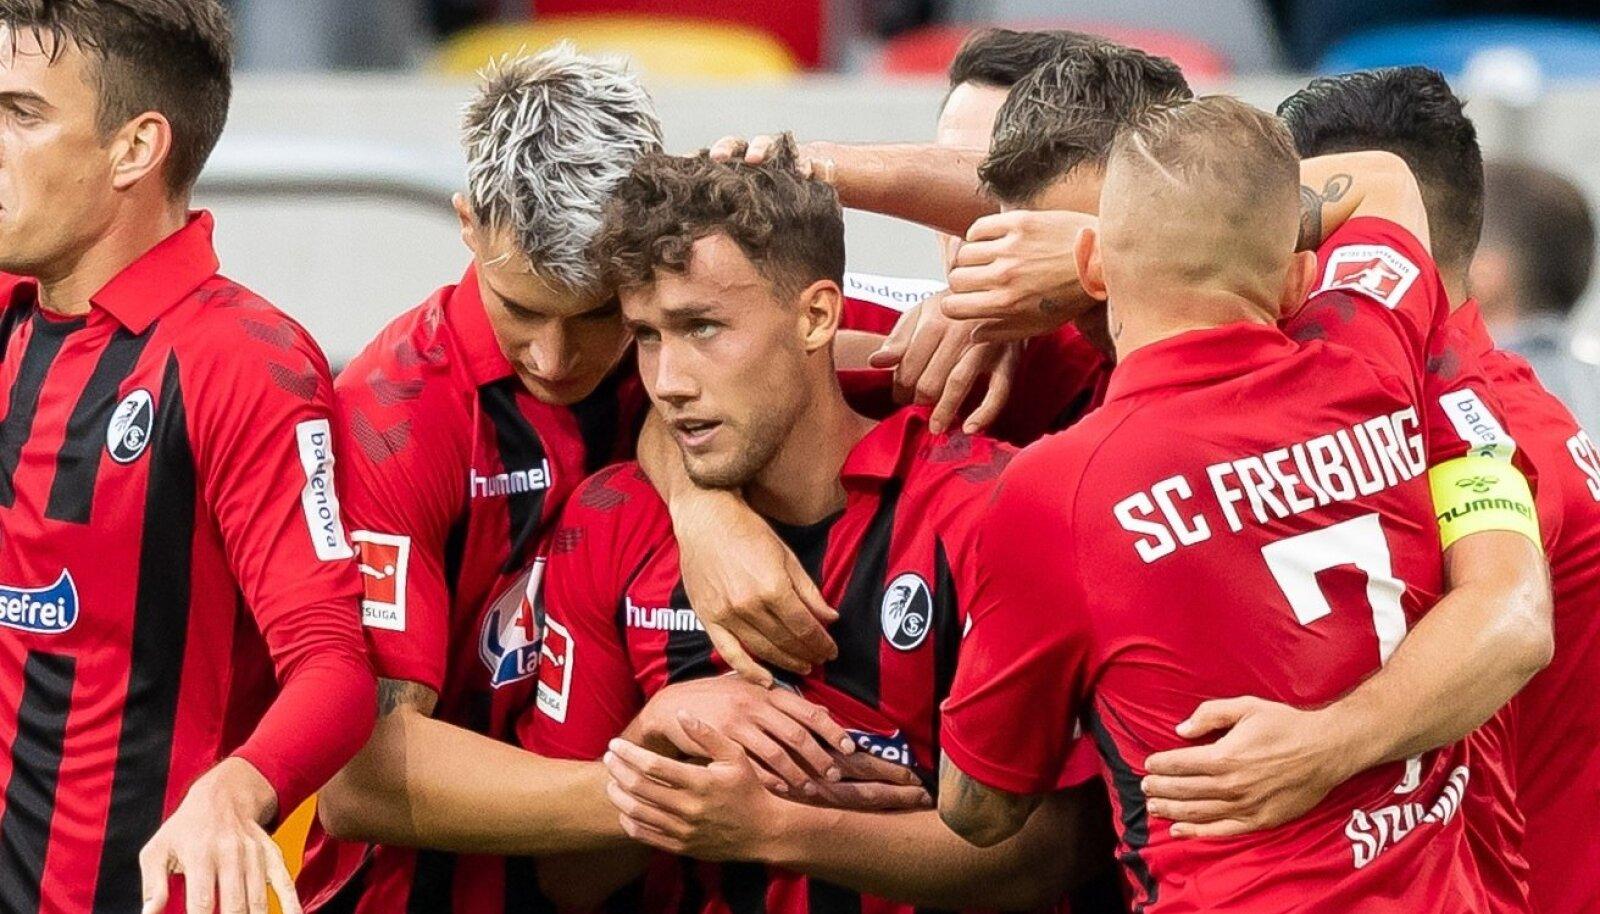 Duesseldorf, Germany 29.09.2019, 1. Bundesliga, 6. Spieltag, Fortuna Duesseldorf - SC Freiburg, Luca Waldschmidt (SCF)